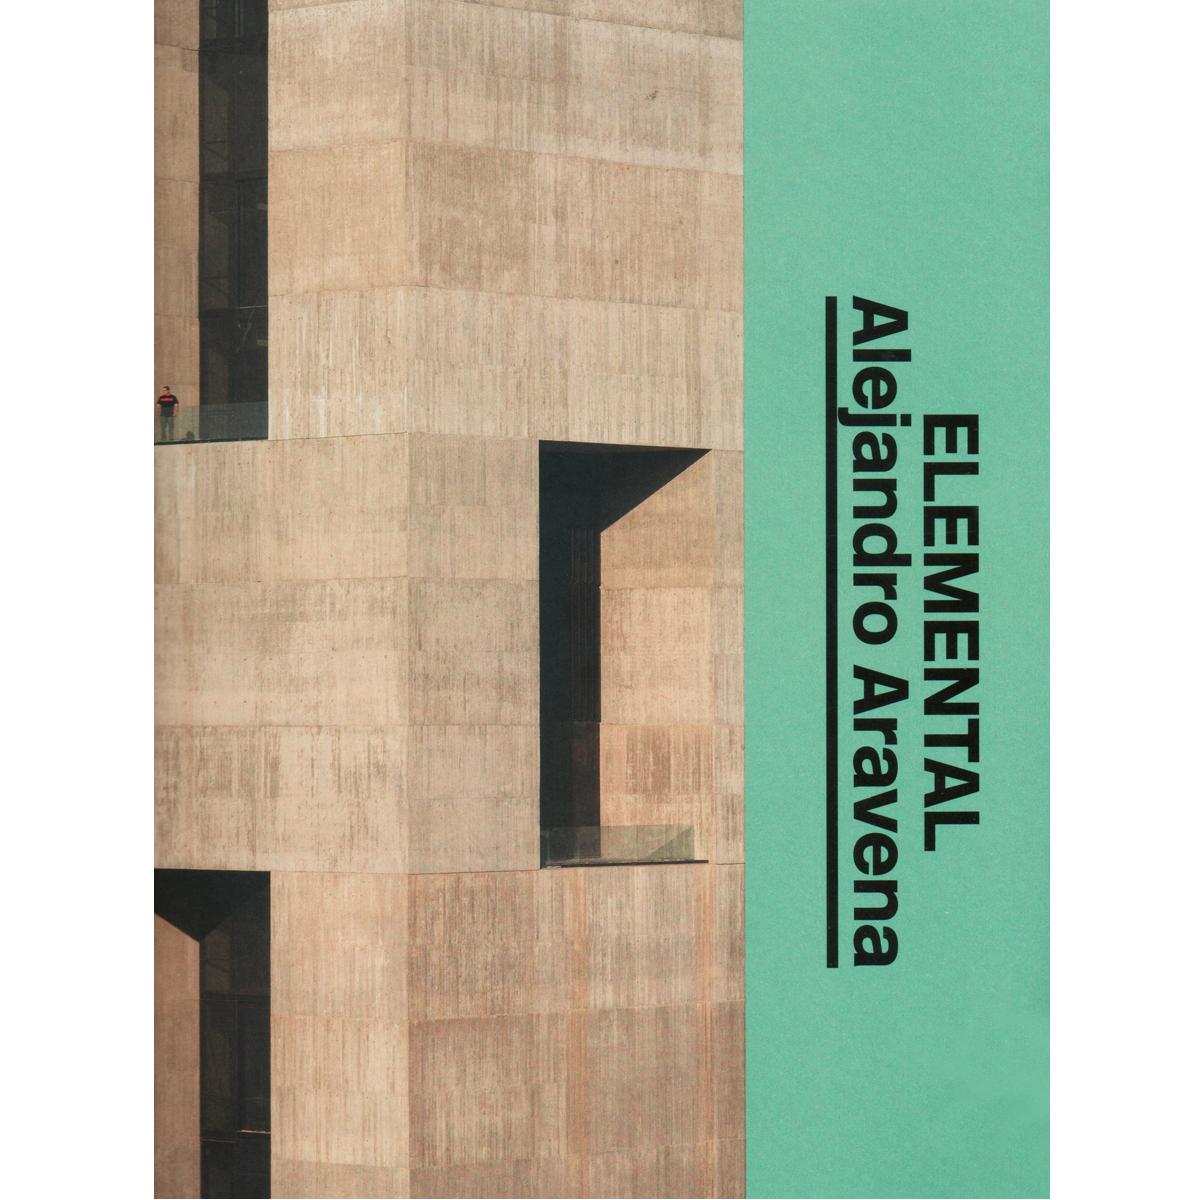 Elemental: Alejandro Aravena